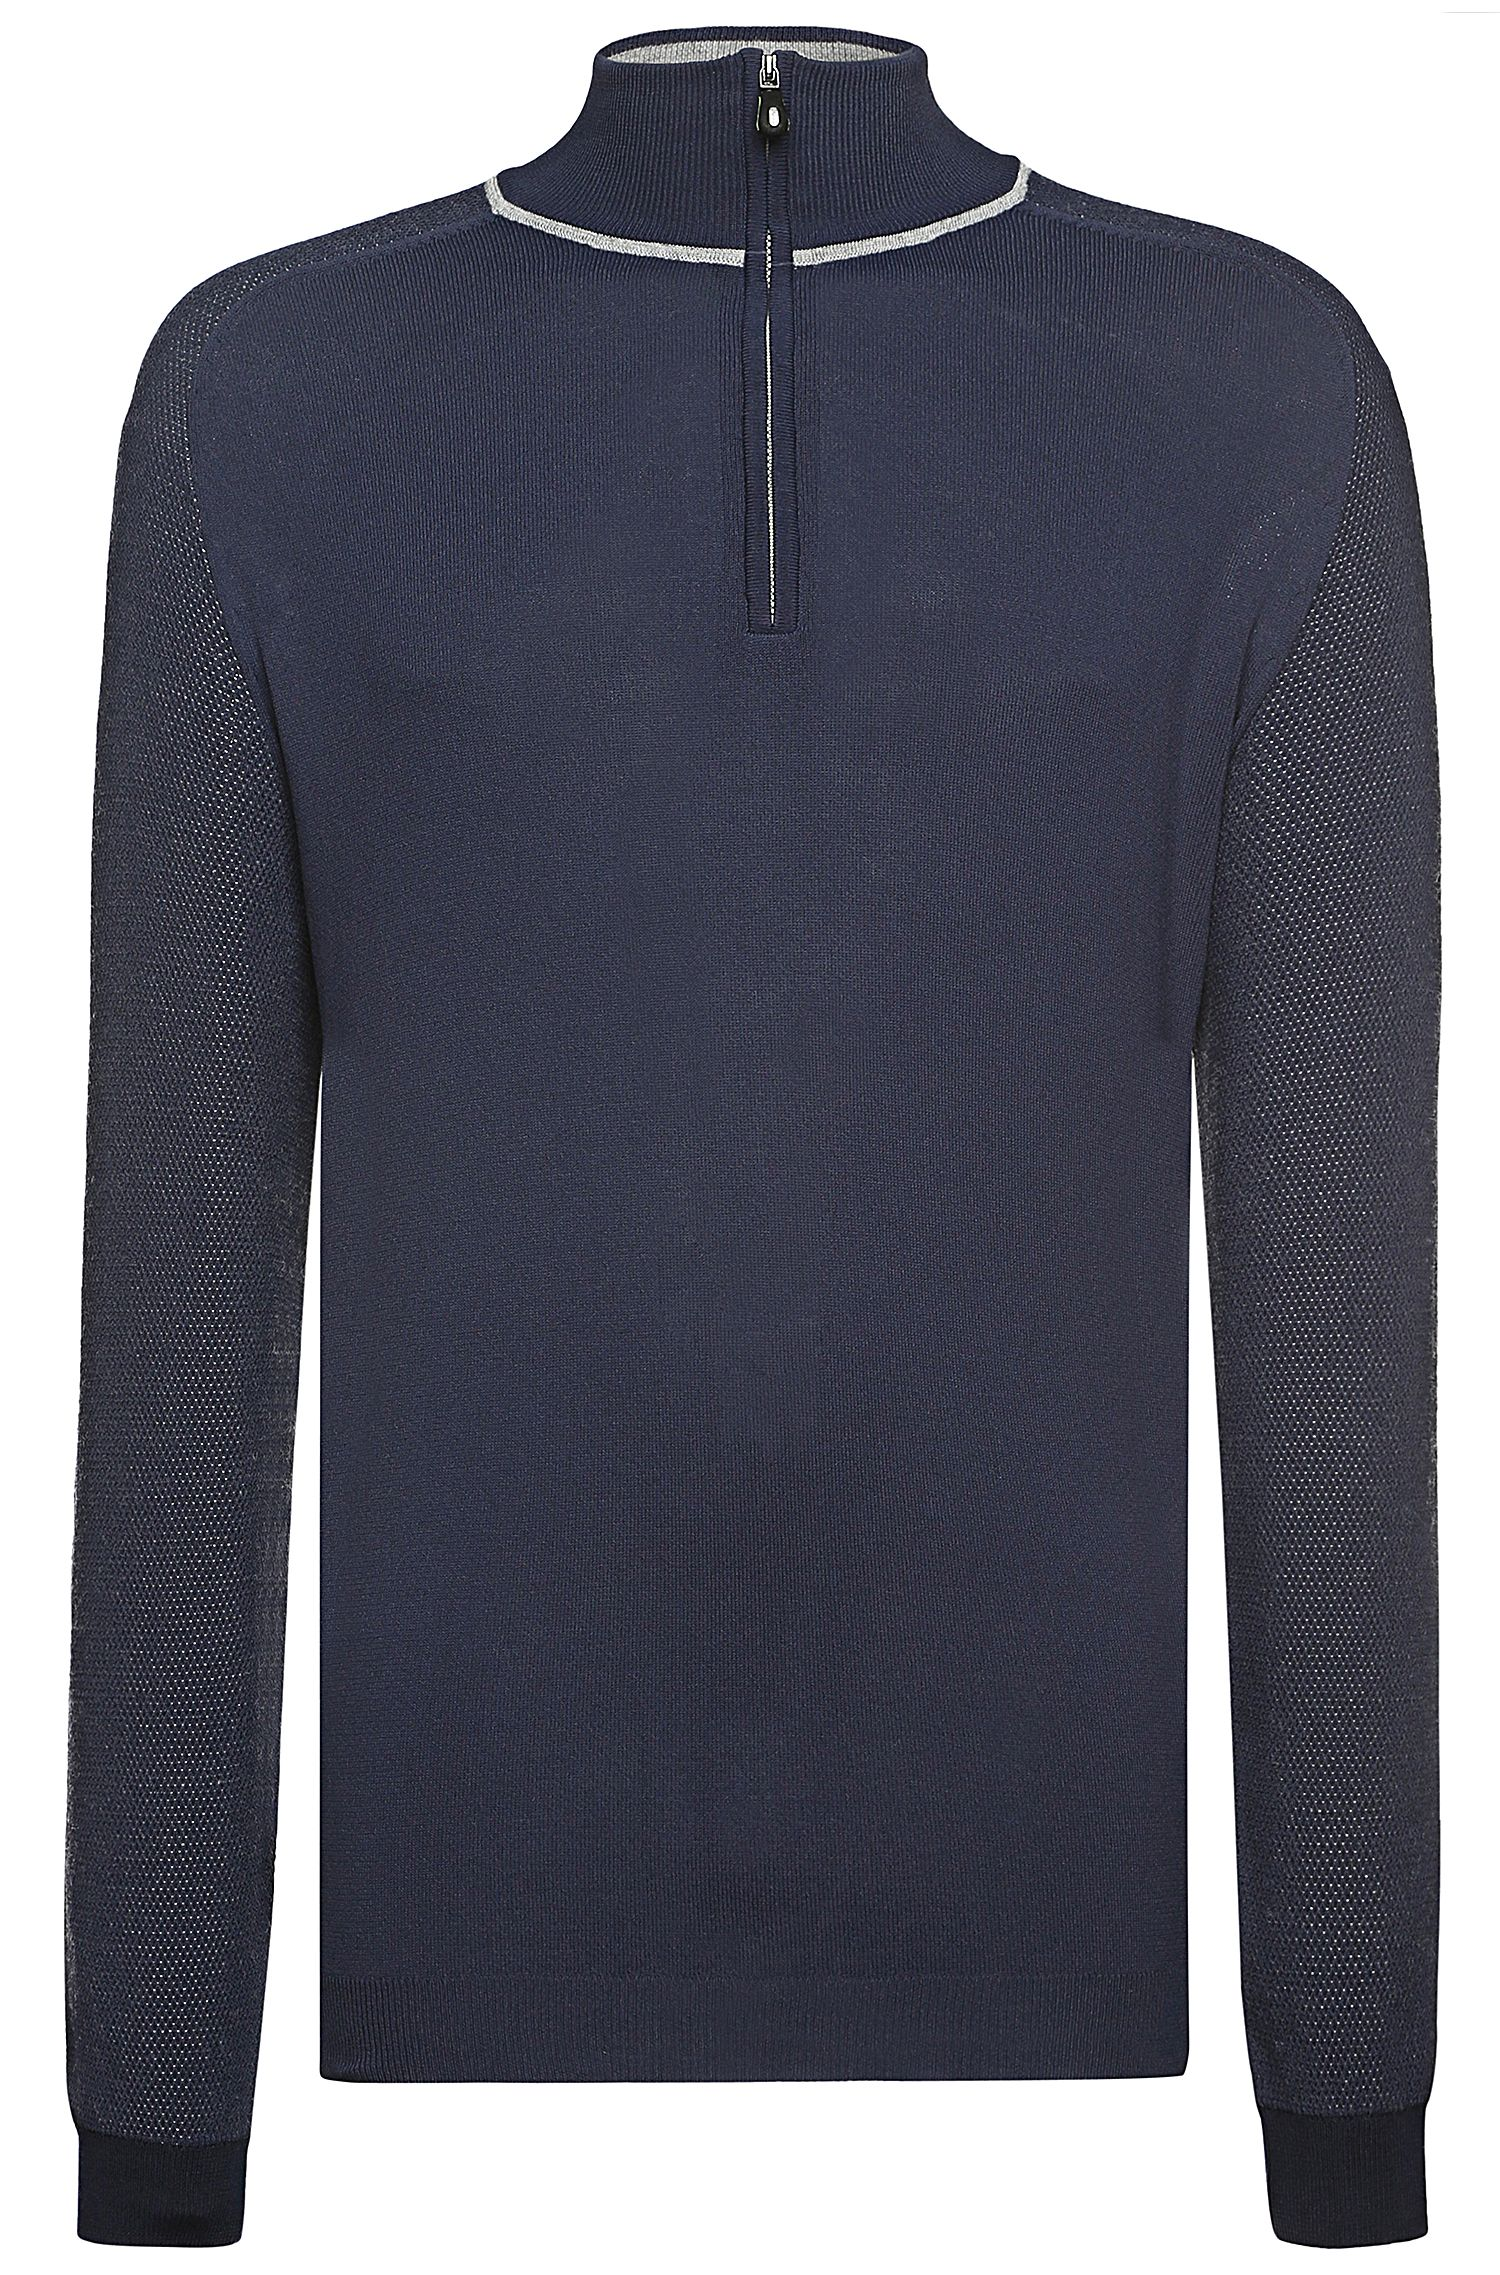 'Zozz' | Virgin Wool Mesh Troyer Collar Sweater